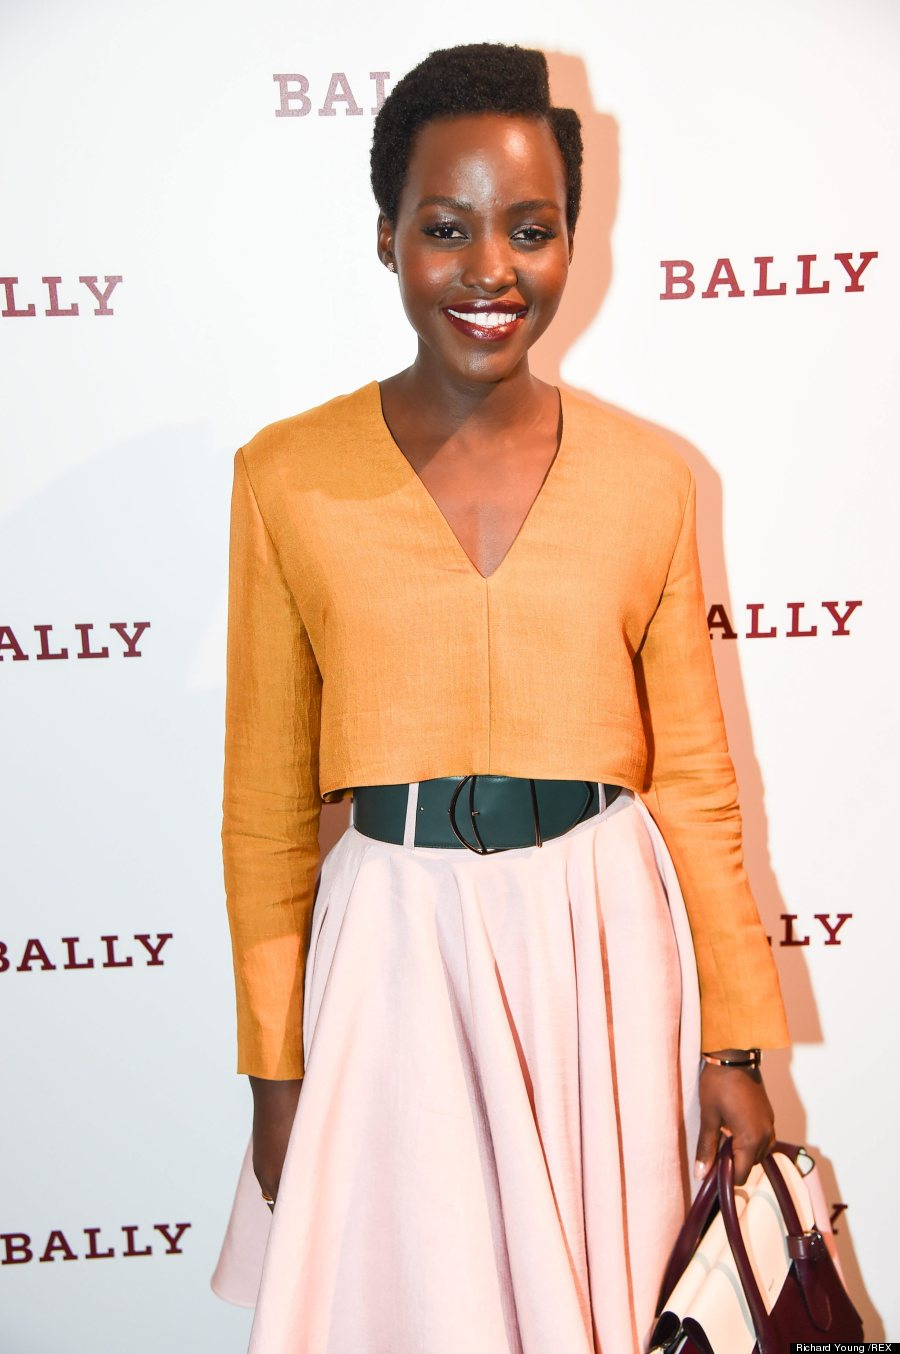 Bally VIP store launch, London, Britain - 22 Oct 2014